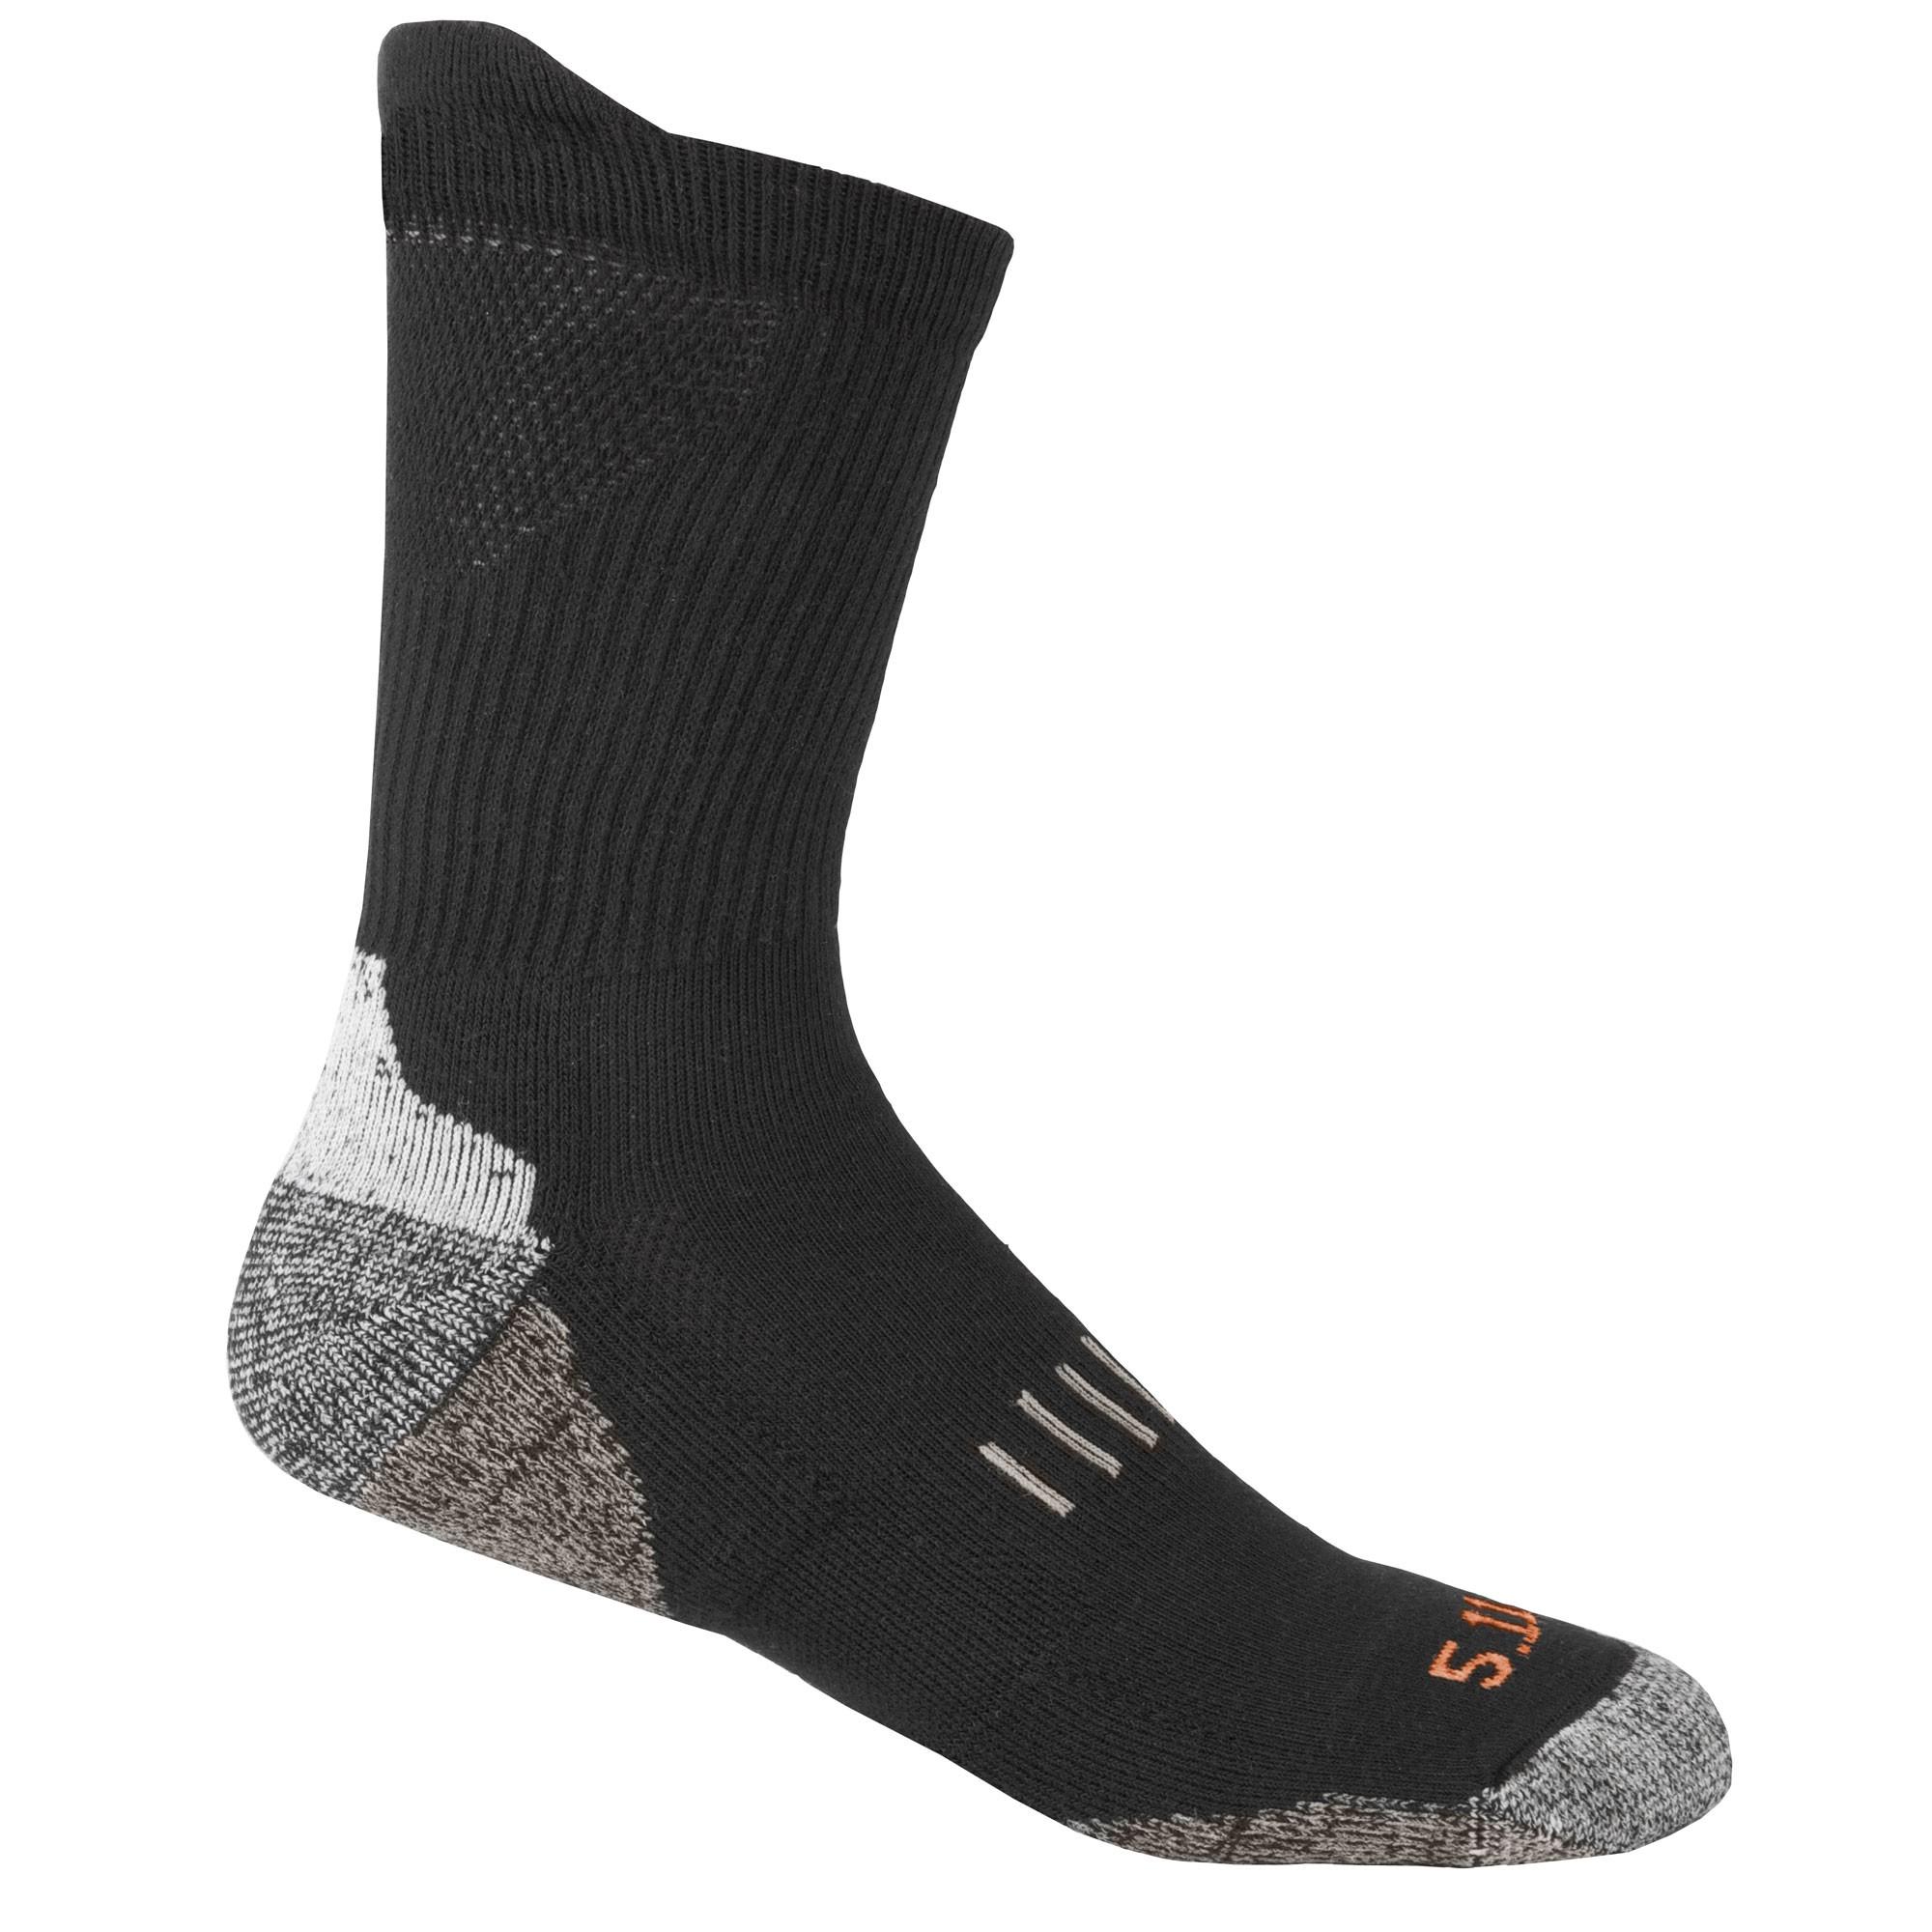 5.11 Year Round Crew Sock